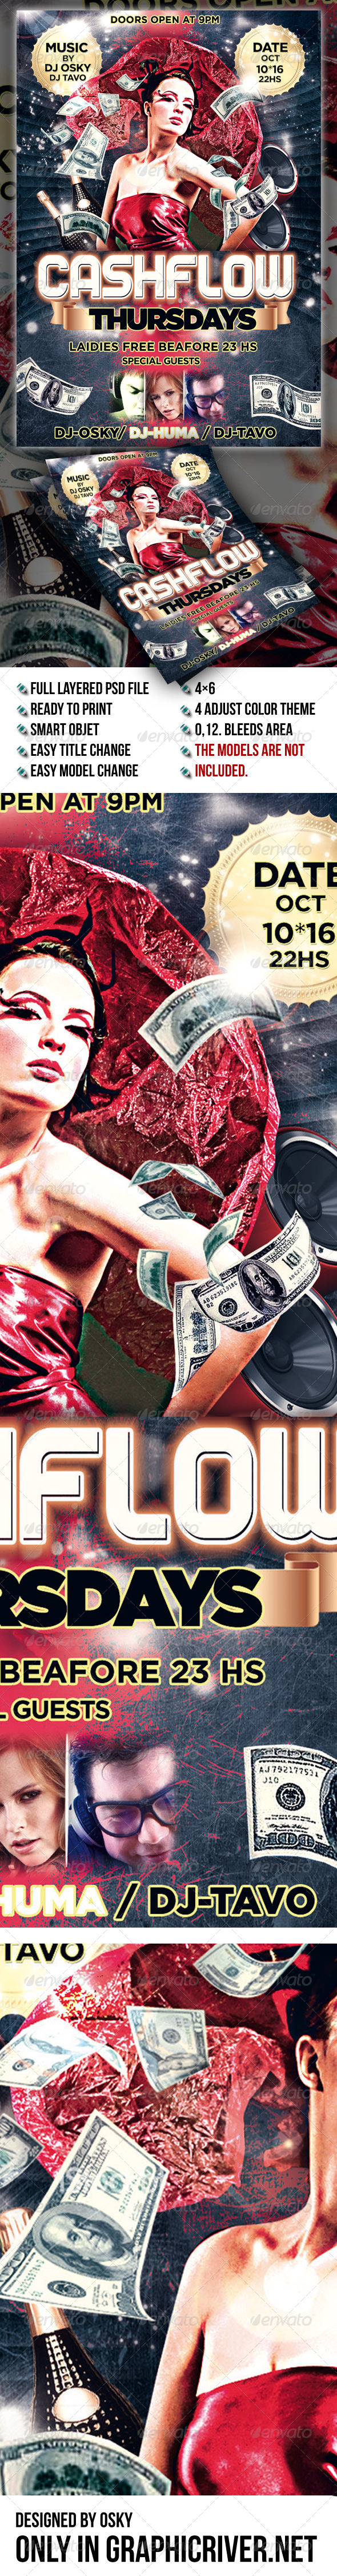 Cashflow Thursdays Flyer - Clubs & Parties Events